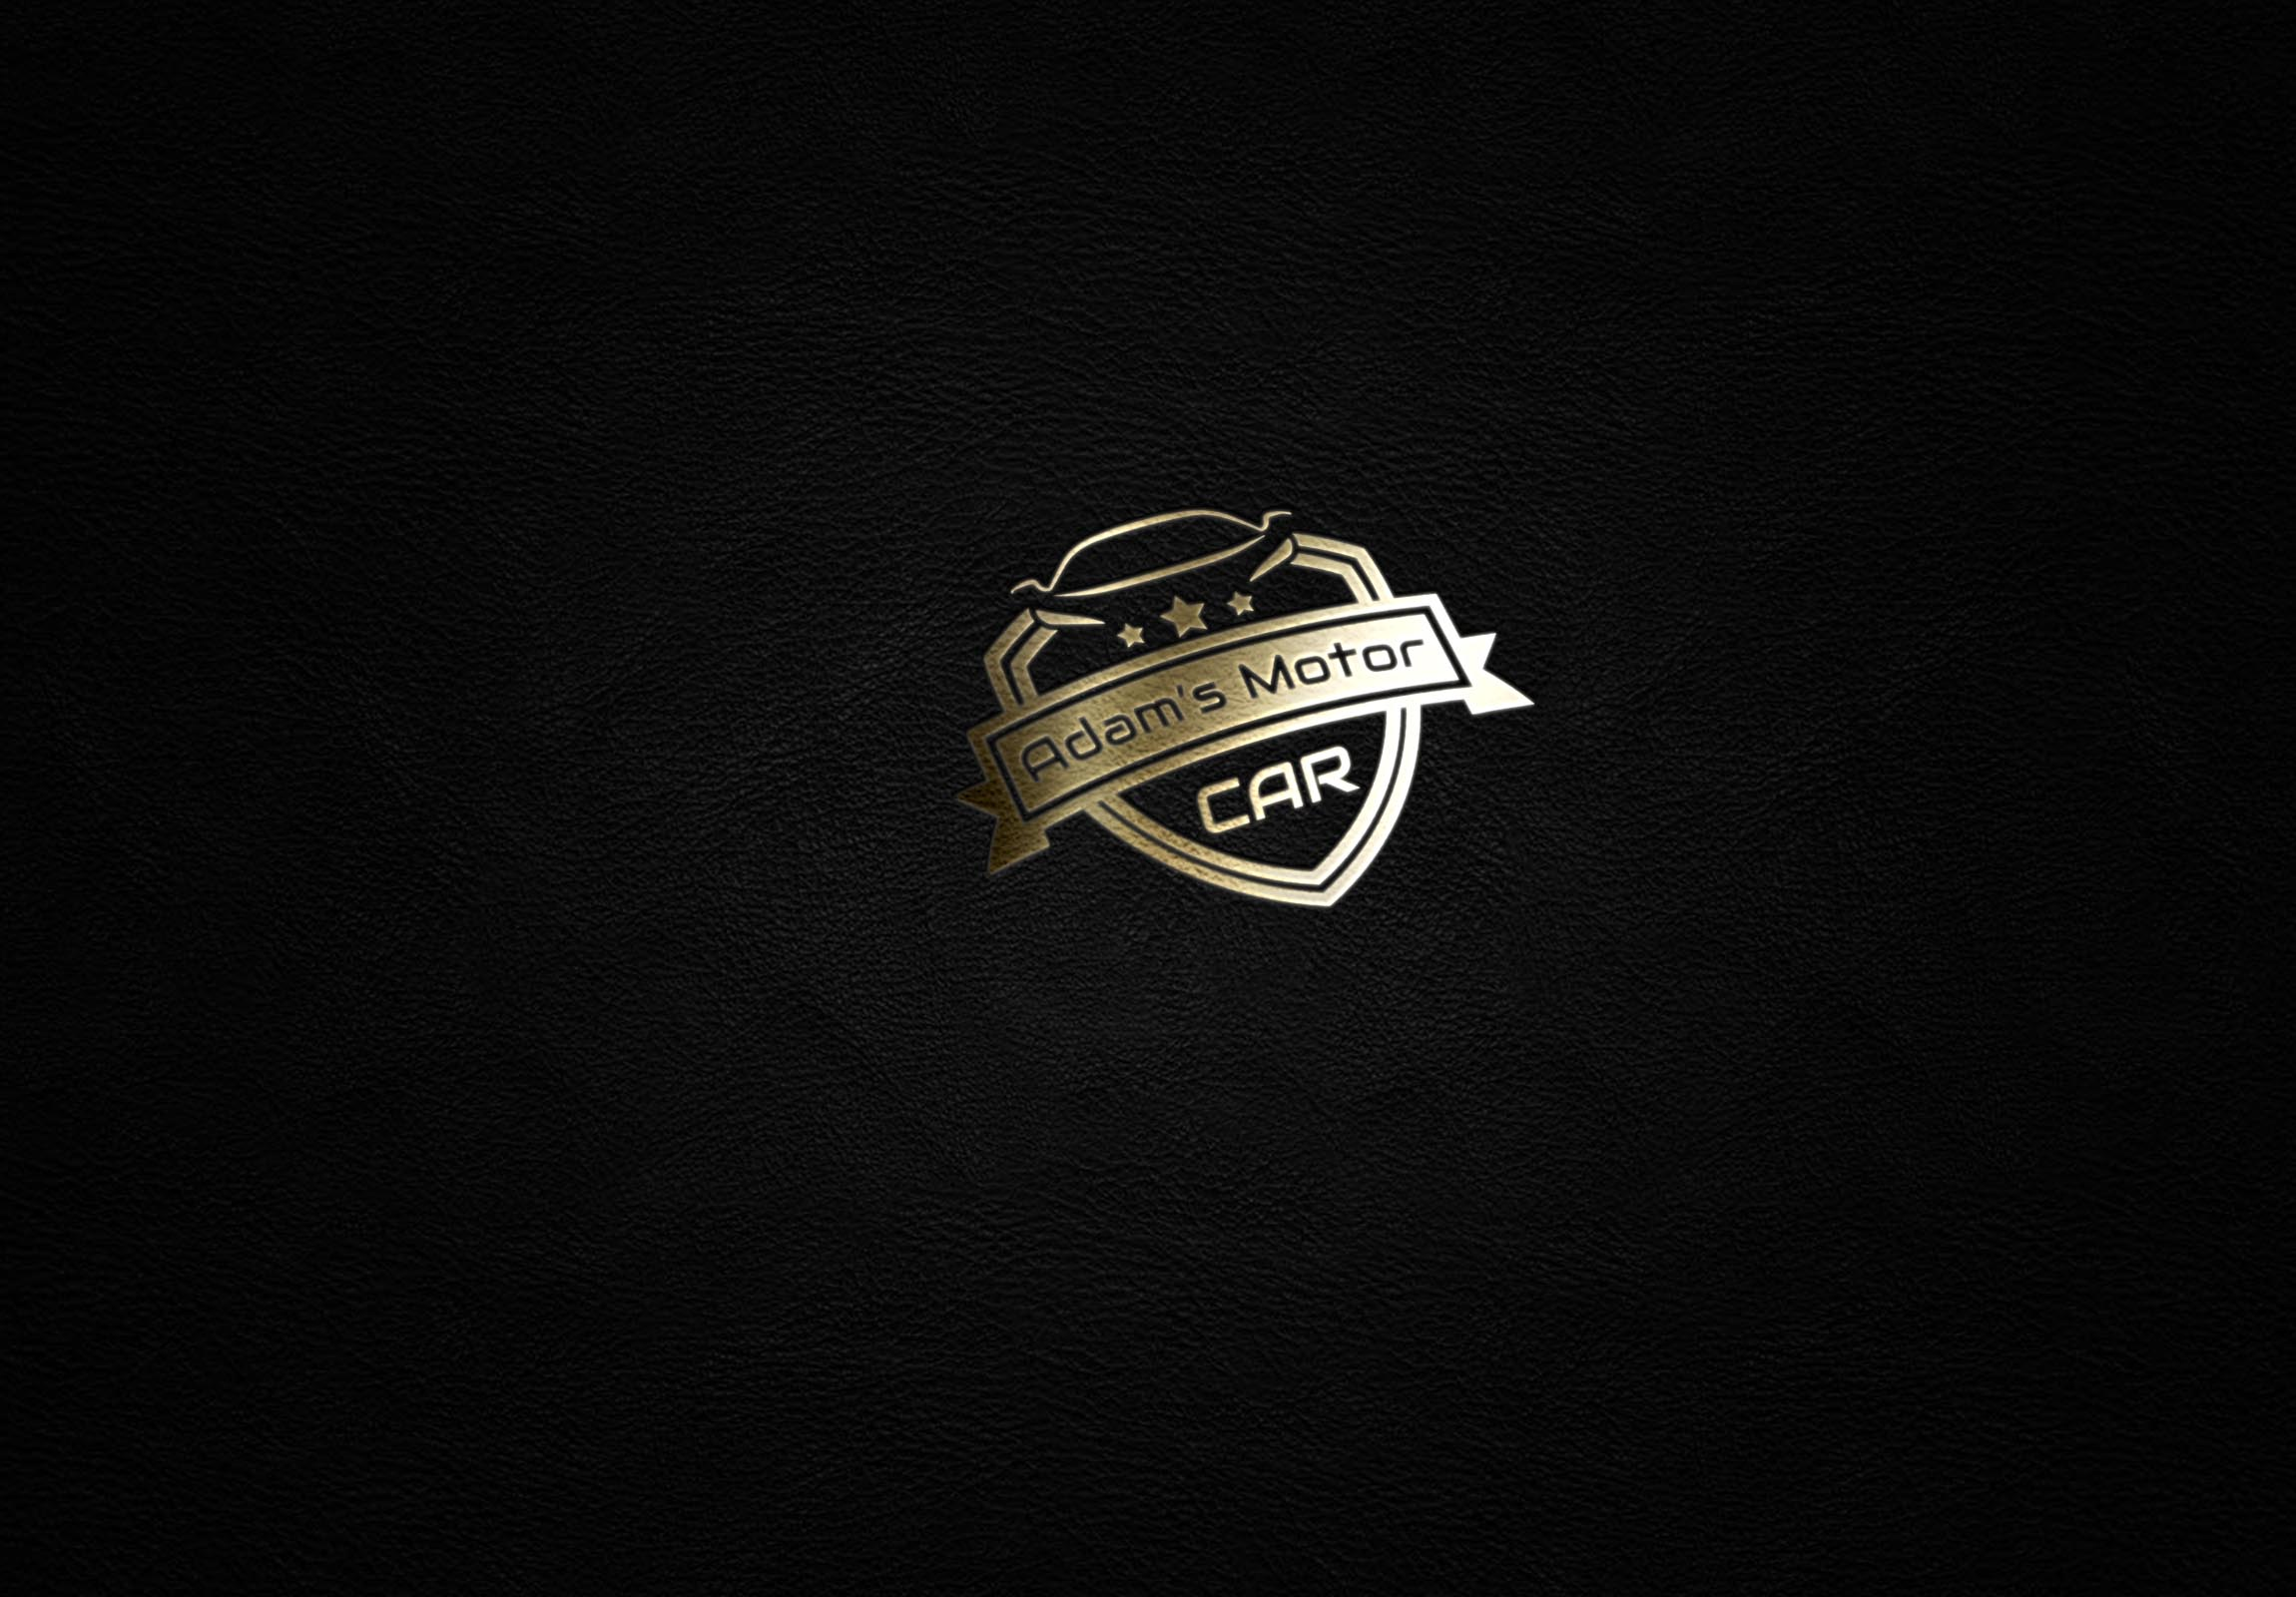 Luxury Car owner logo idea